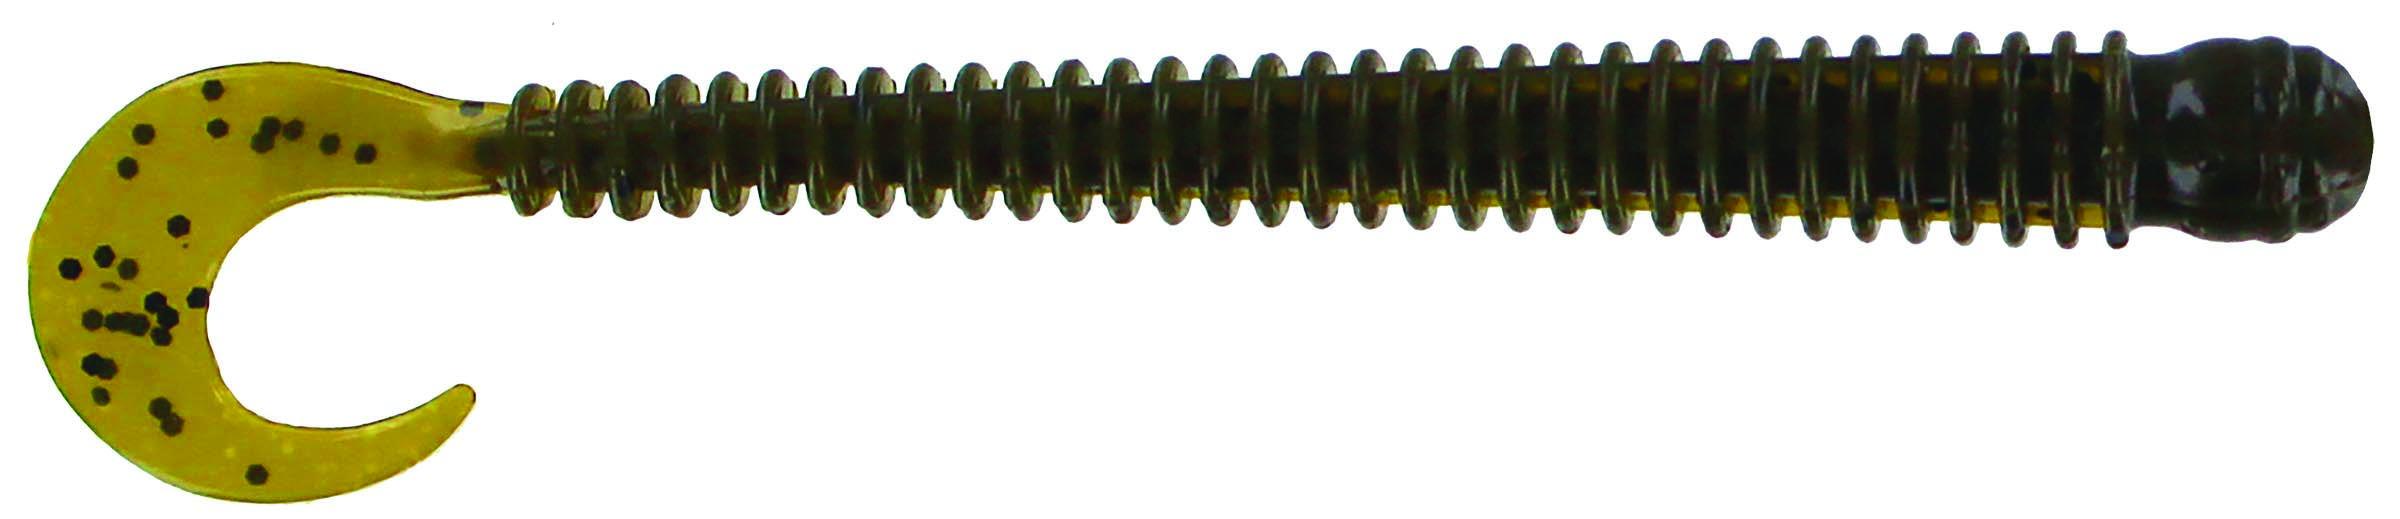 Big Bite Baits - Disc Ring Worm - 4 inch - RW-407 - GREEN PUMPKIN